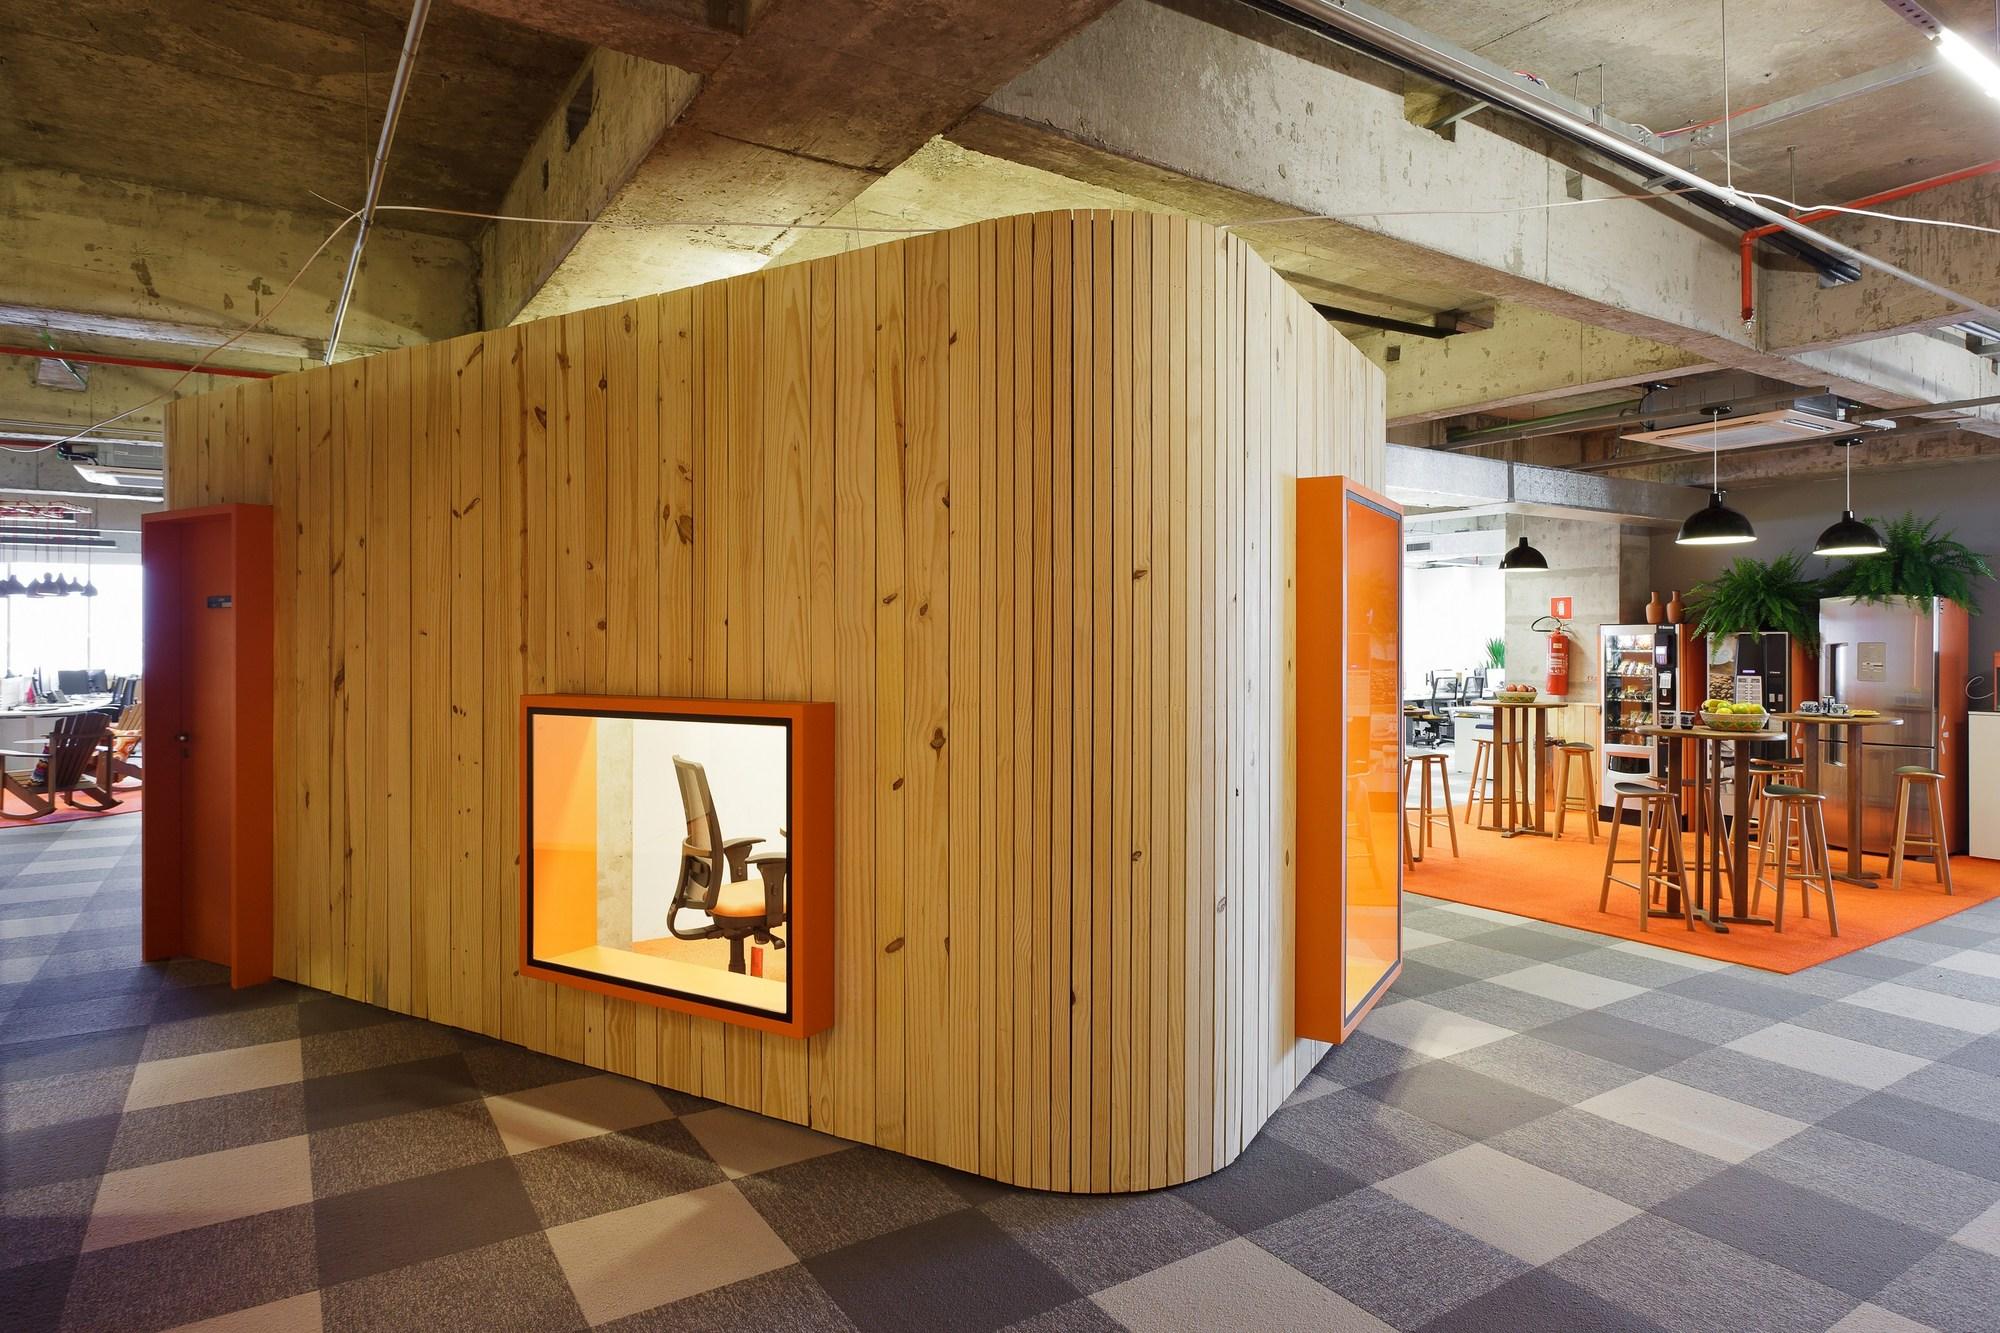 Est Dio Guto Requena Oficina Plataforma Arquitectura # Muebles Requena Requena